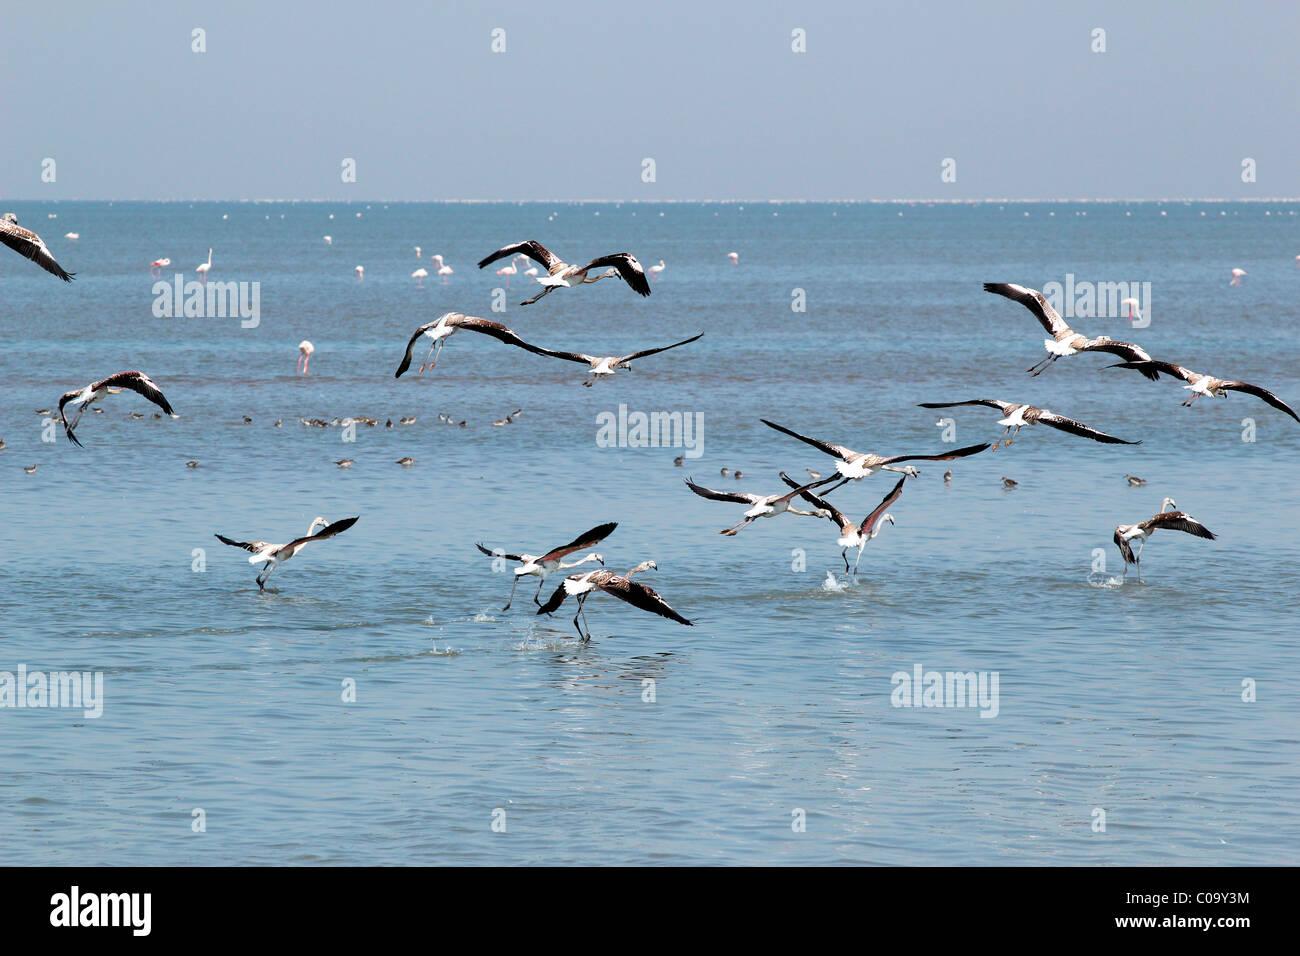 Flamingo birds in Rann of Kutch, Gujarat, India - Stock Image